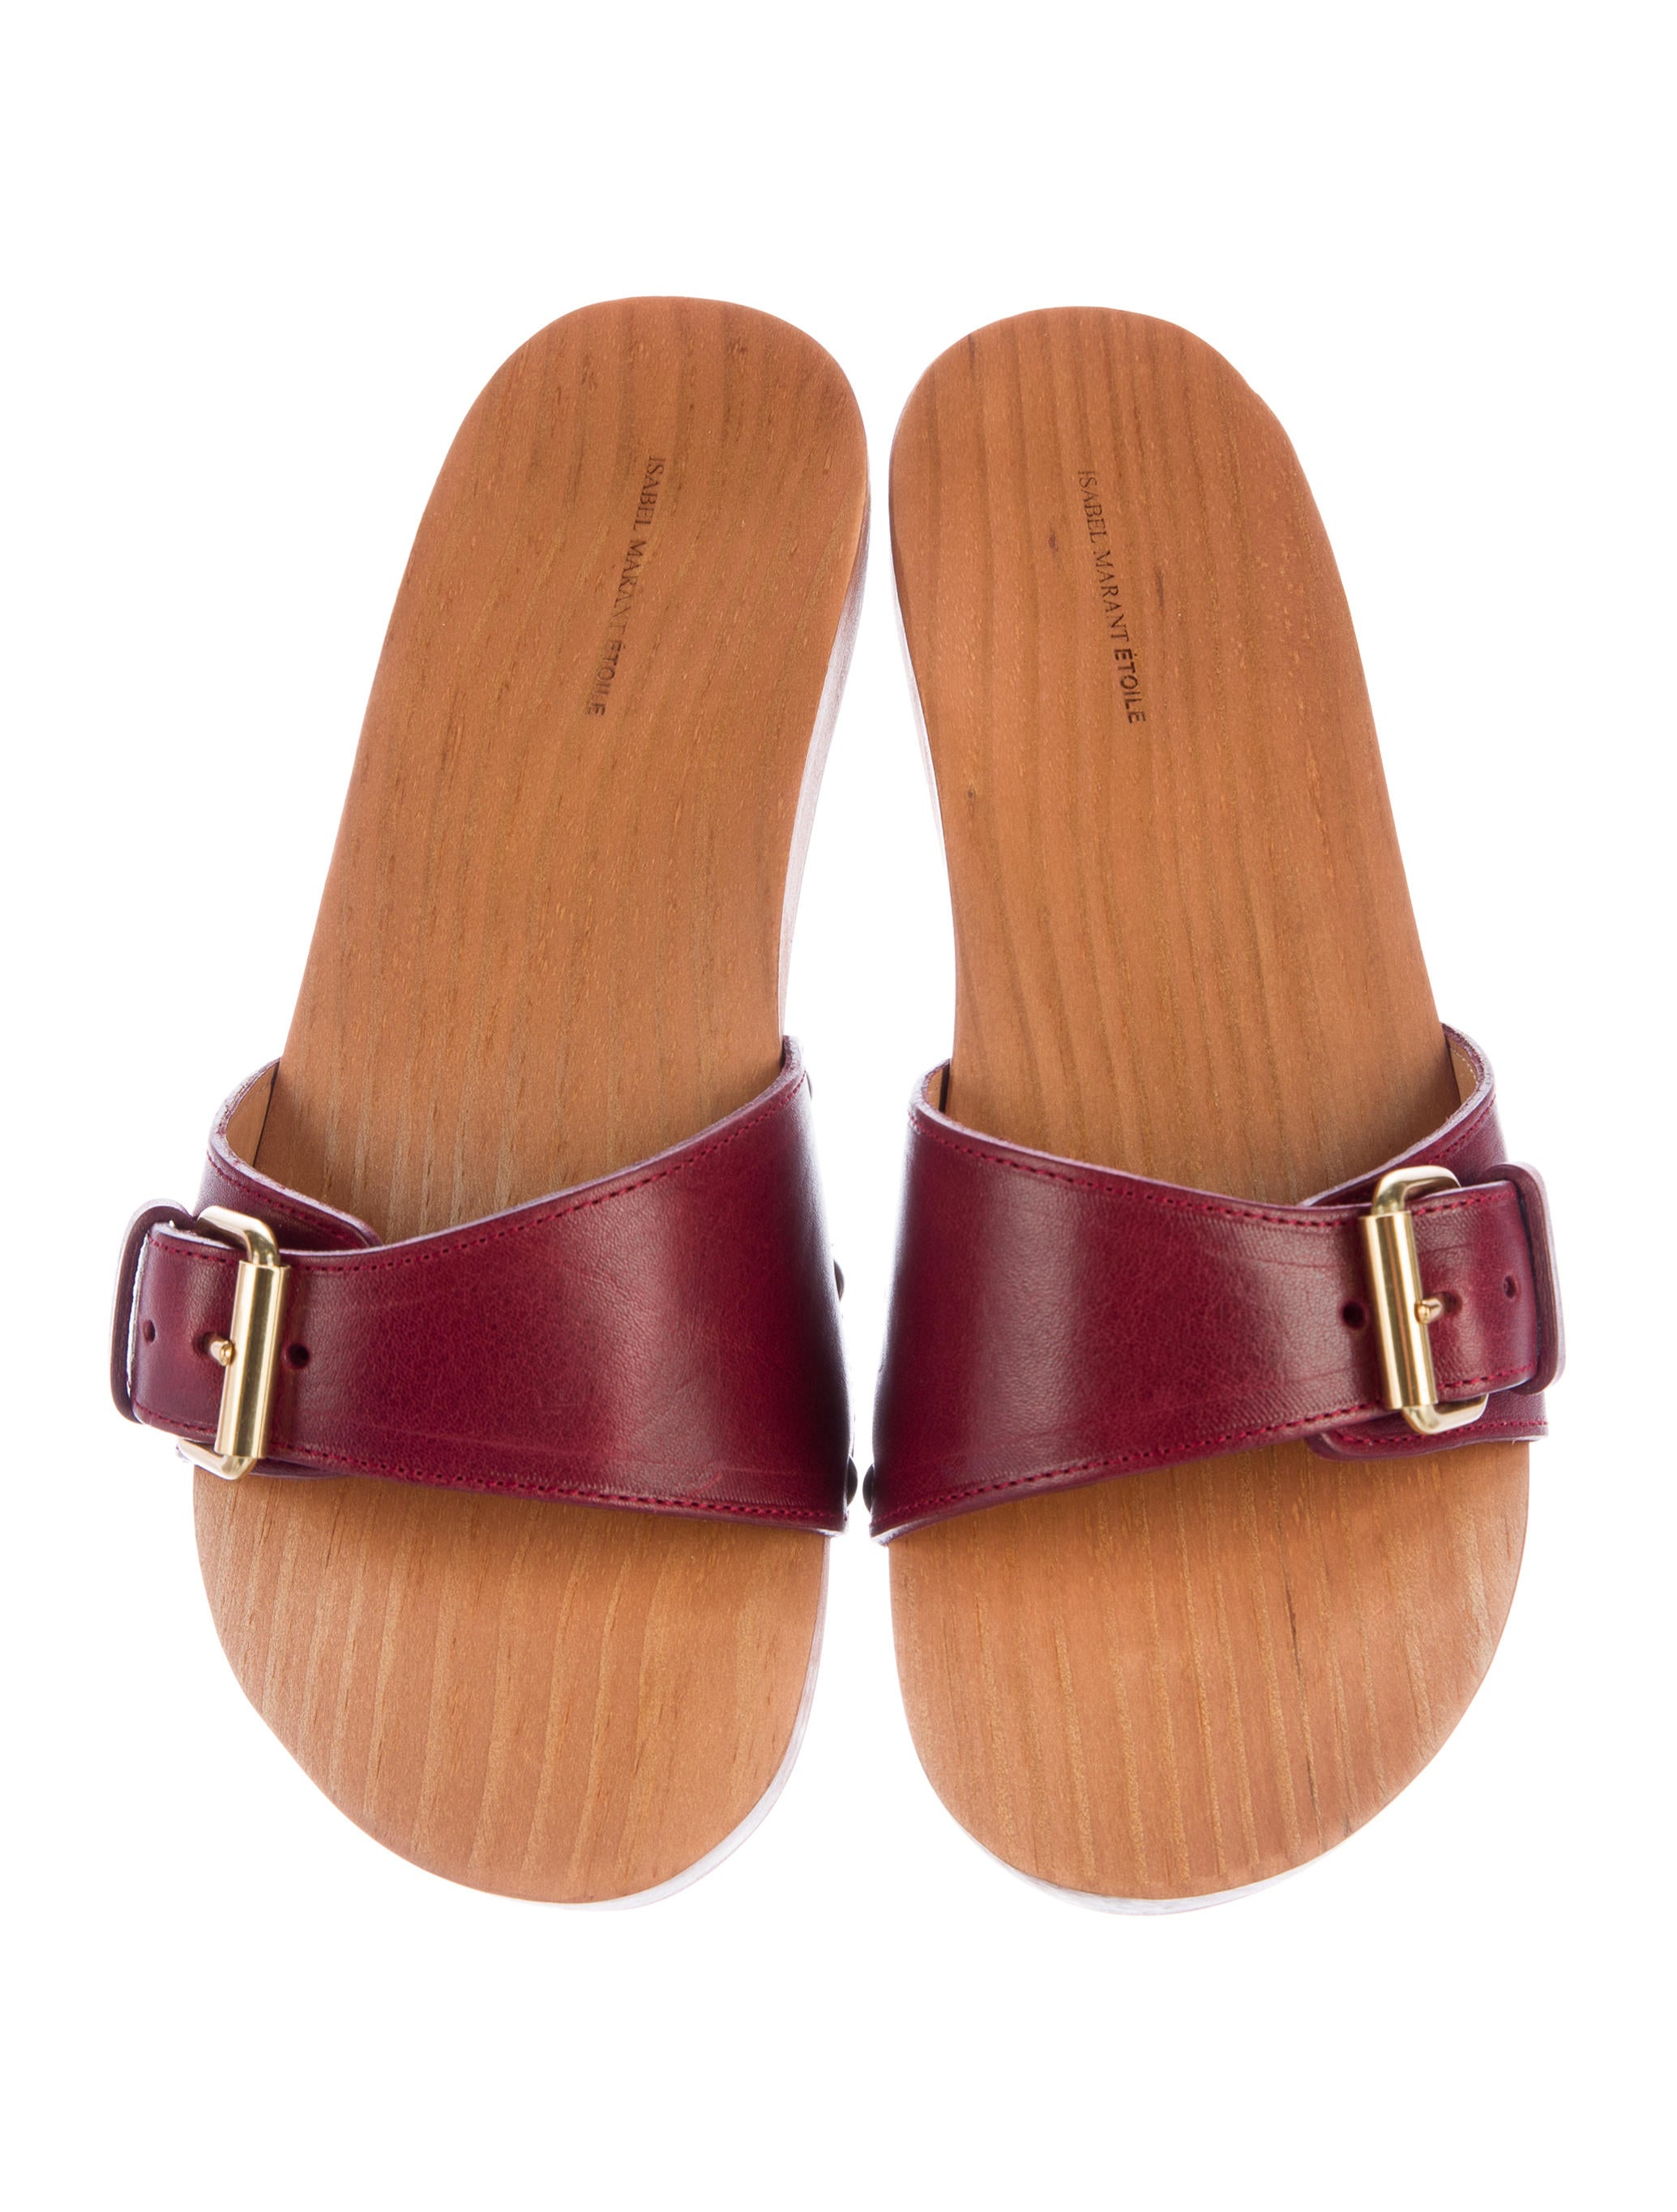 201 Toile Isabel Marant Tadley Slide Sandals W Tags Shoes